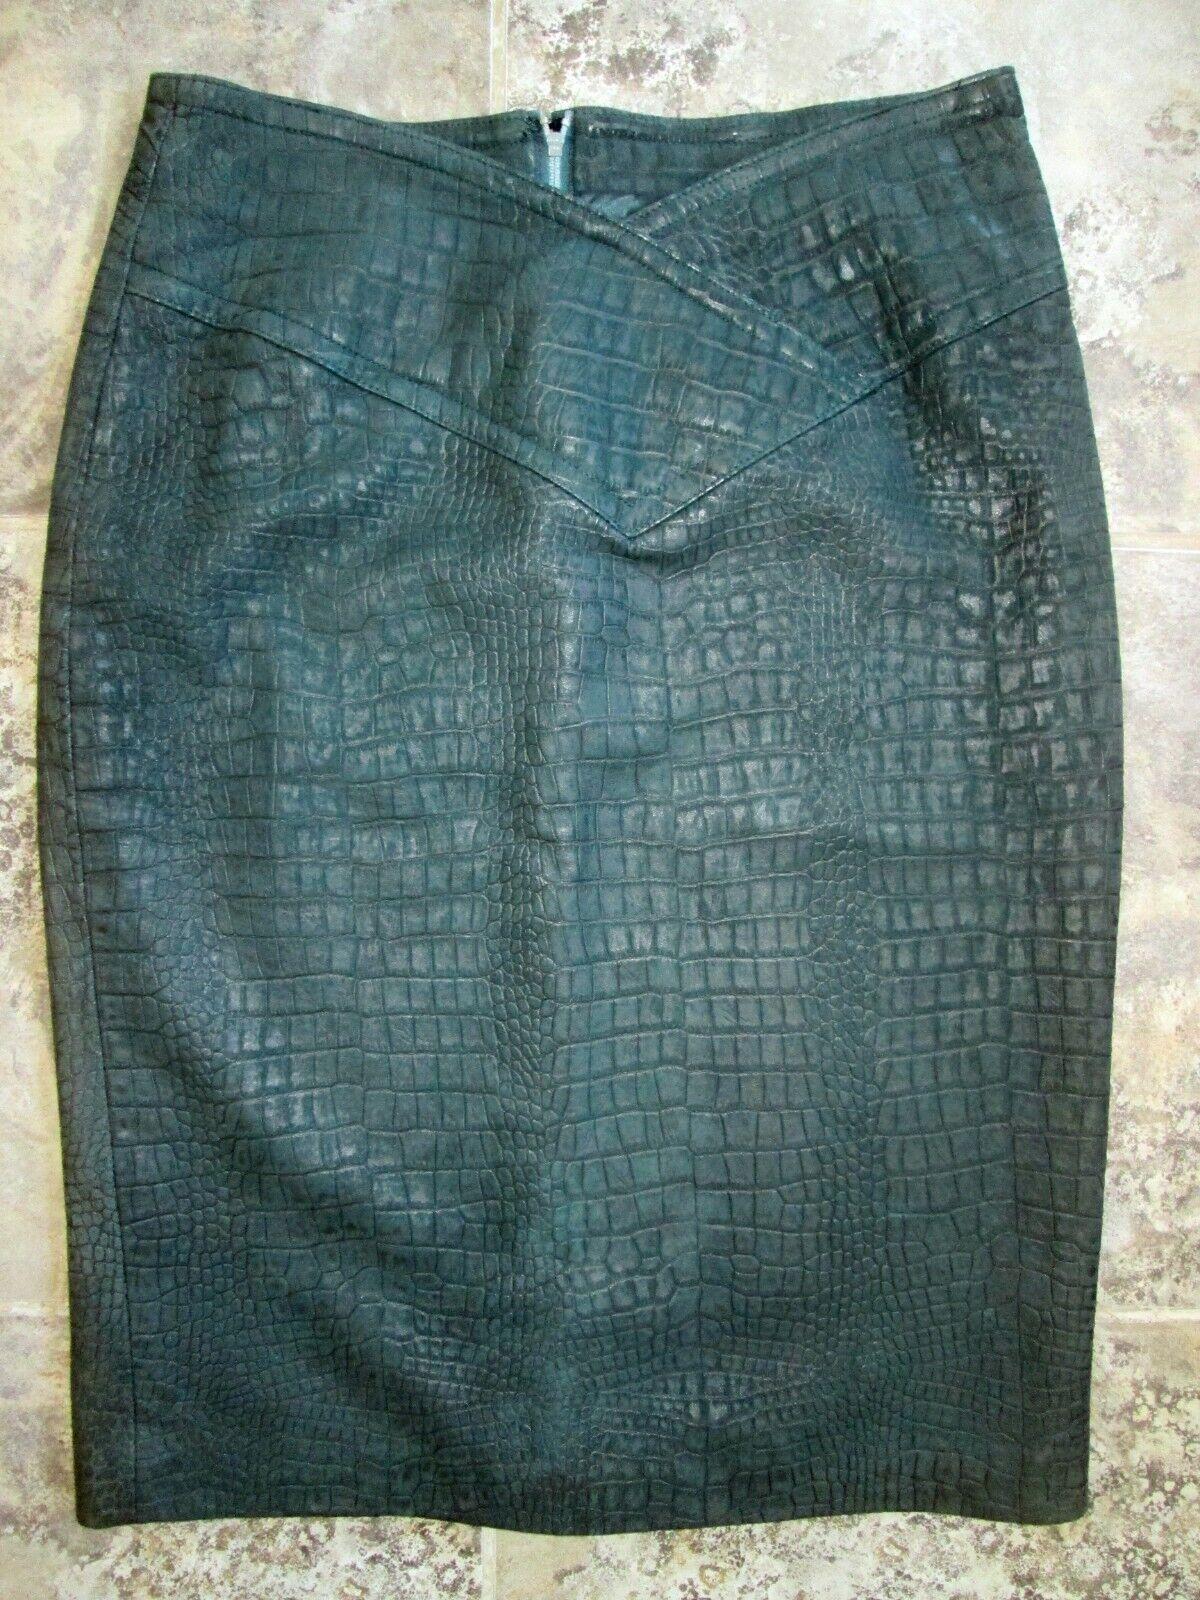 Bruno Magli Skirt 10 100% Leather Dark Green Short Pencil Straight Textured EUC